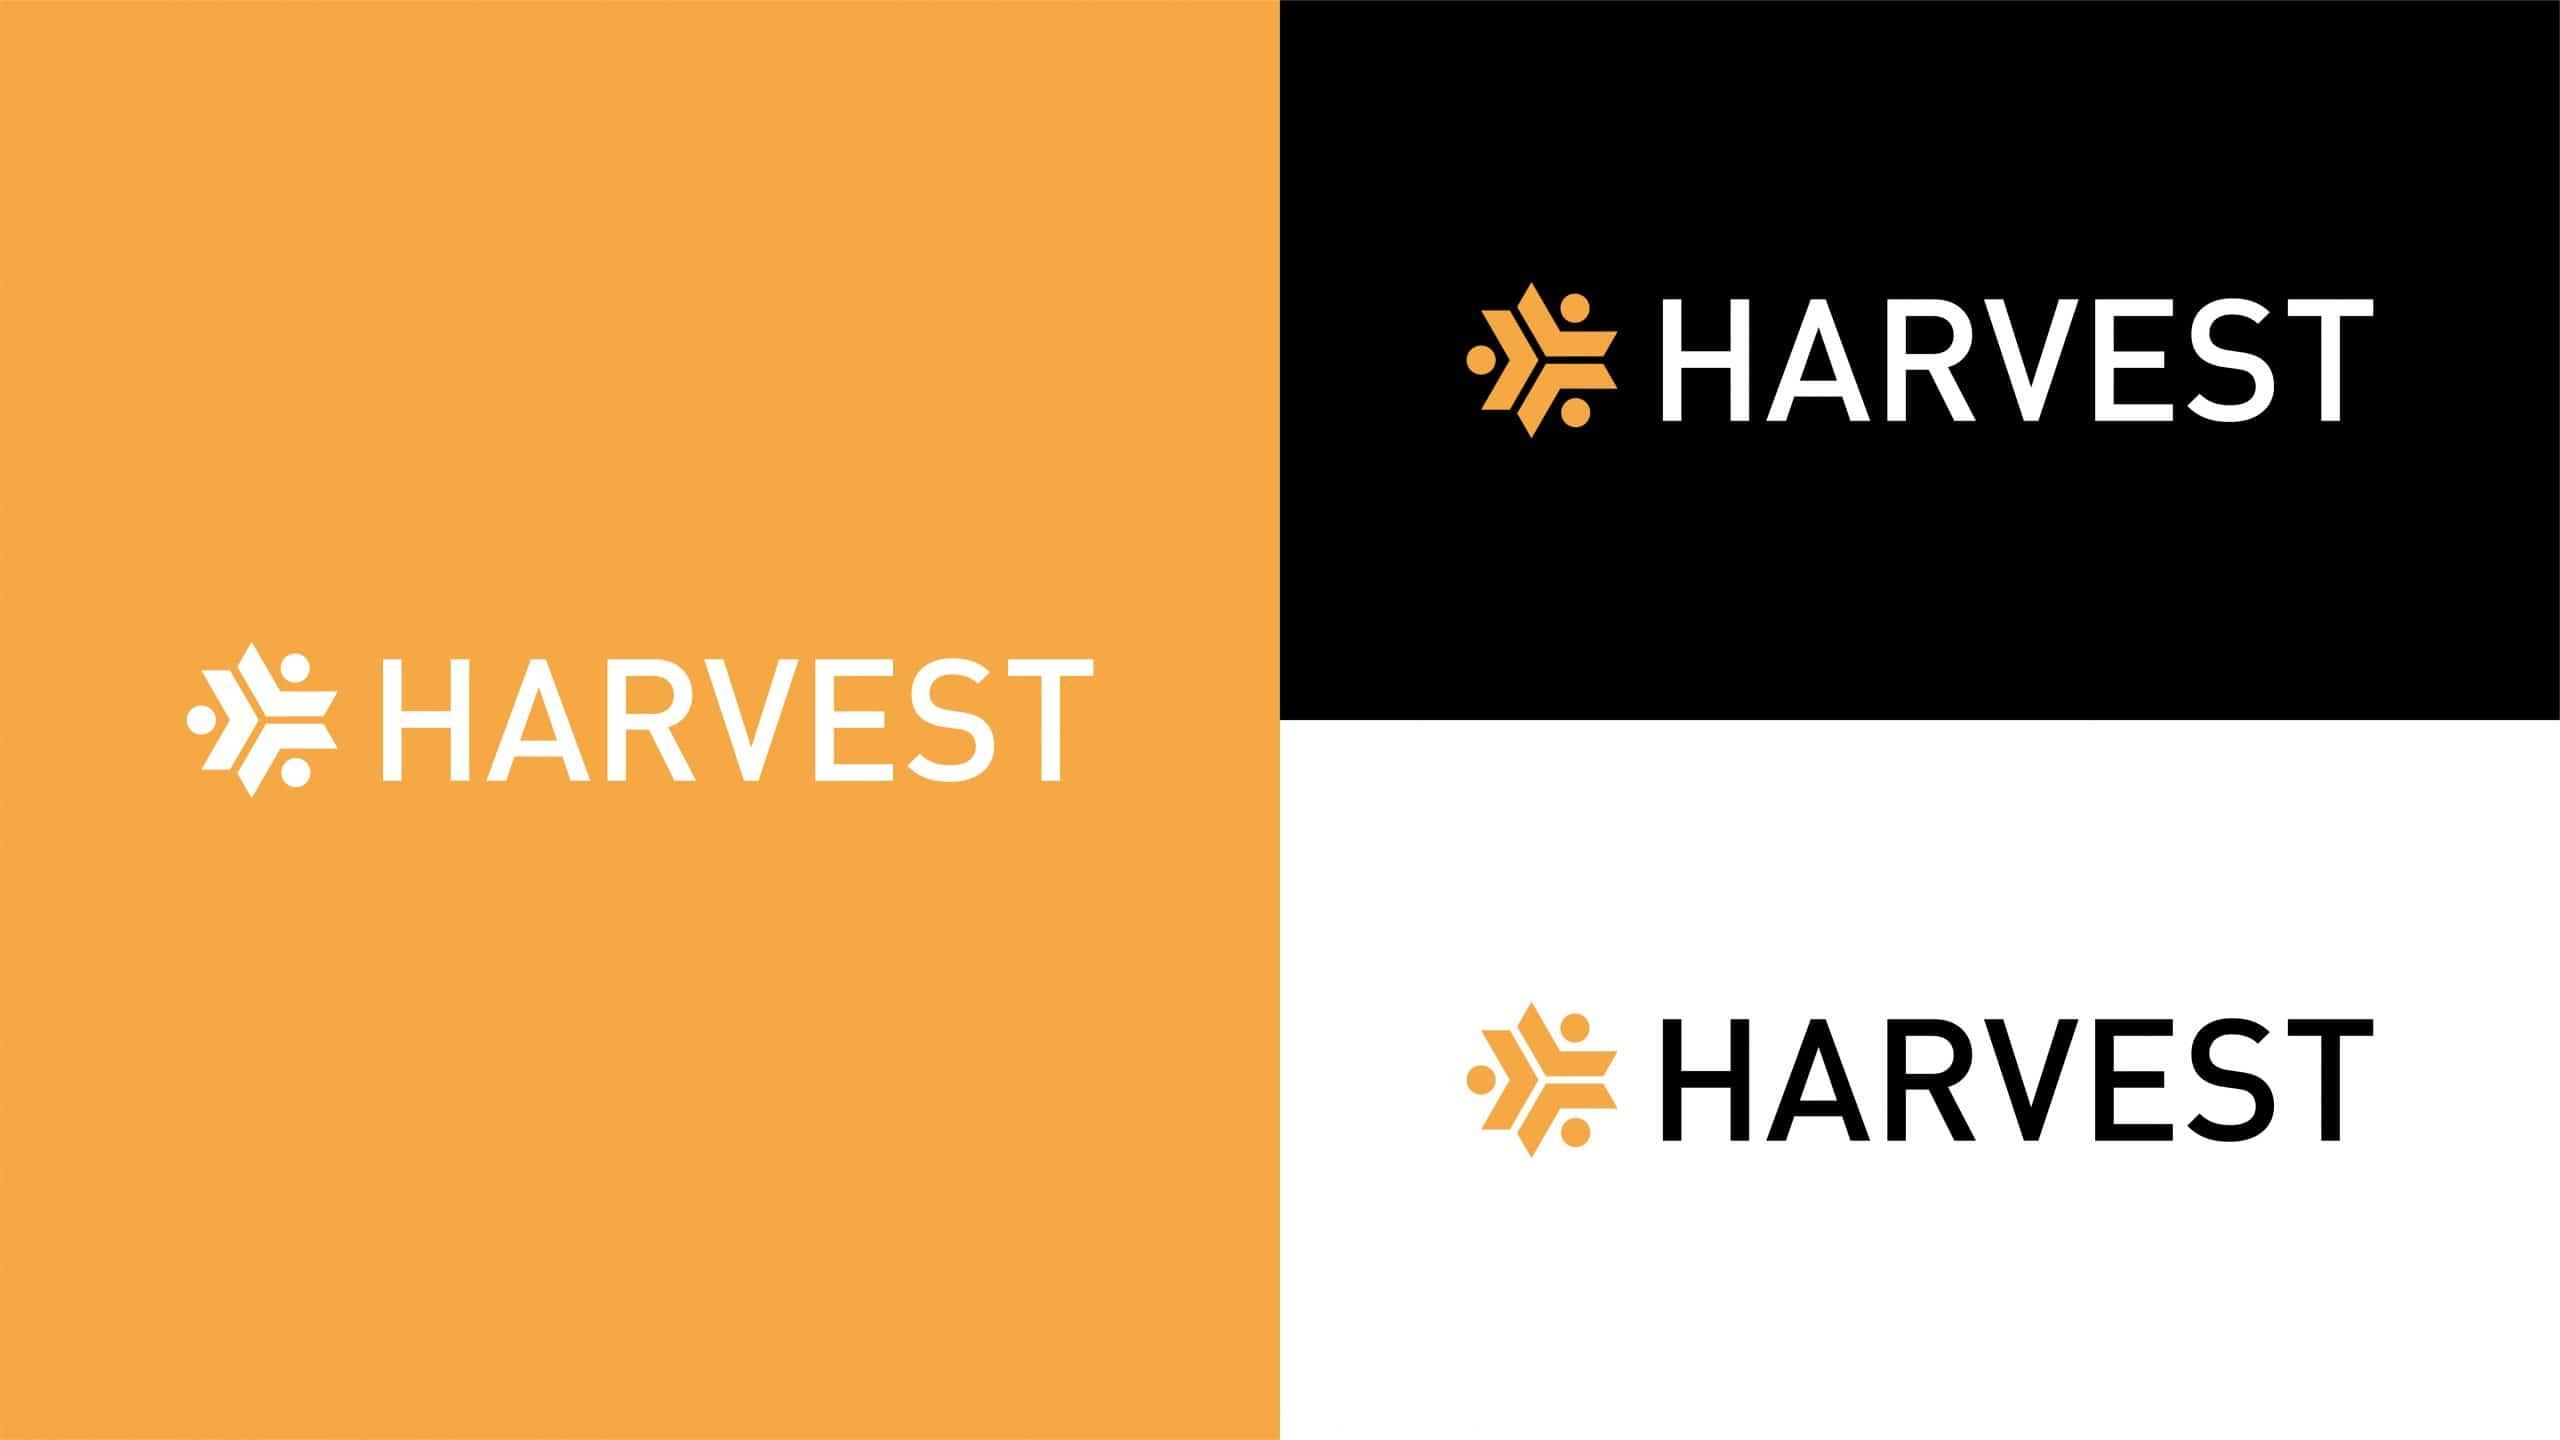 fitosophy-mit100k-harvest2